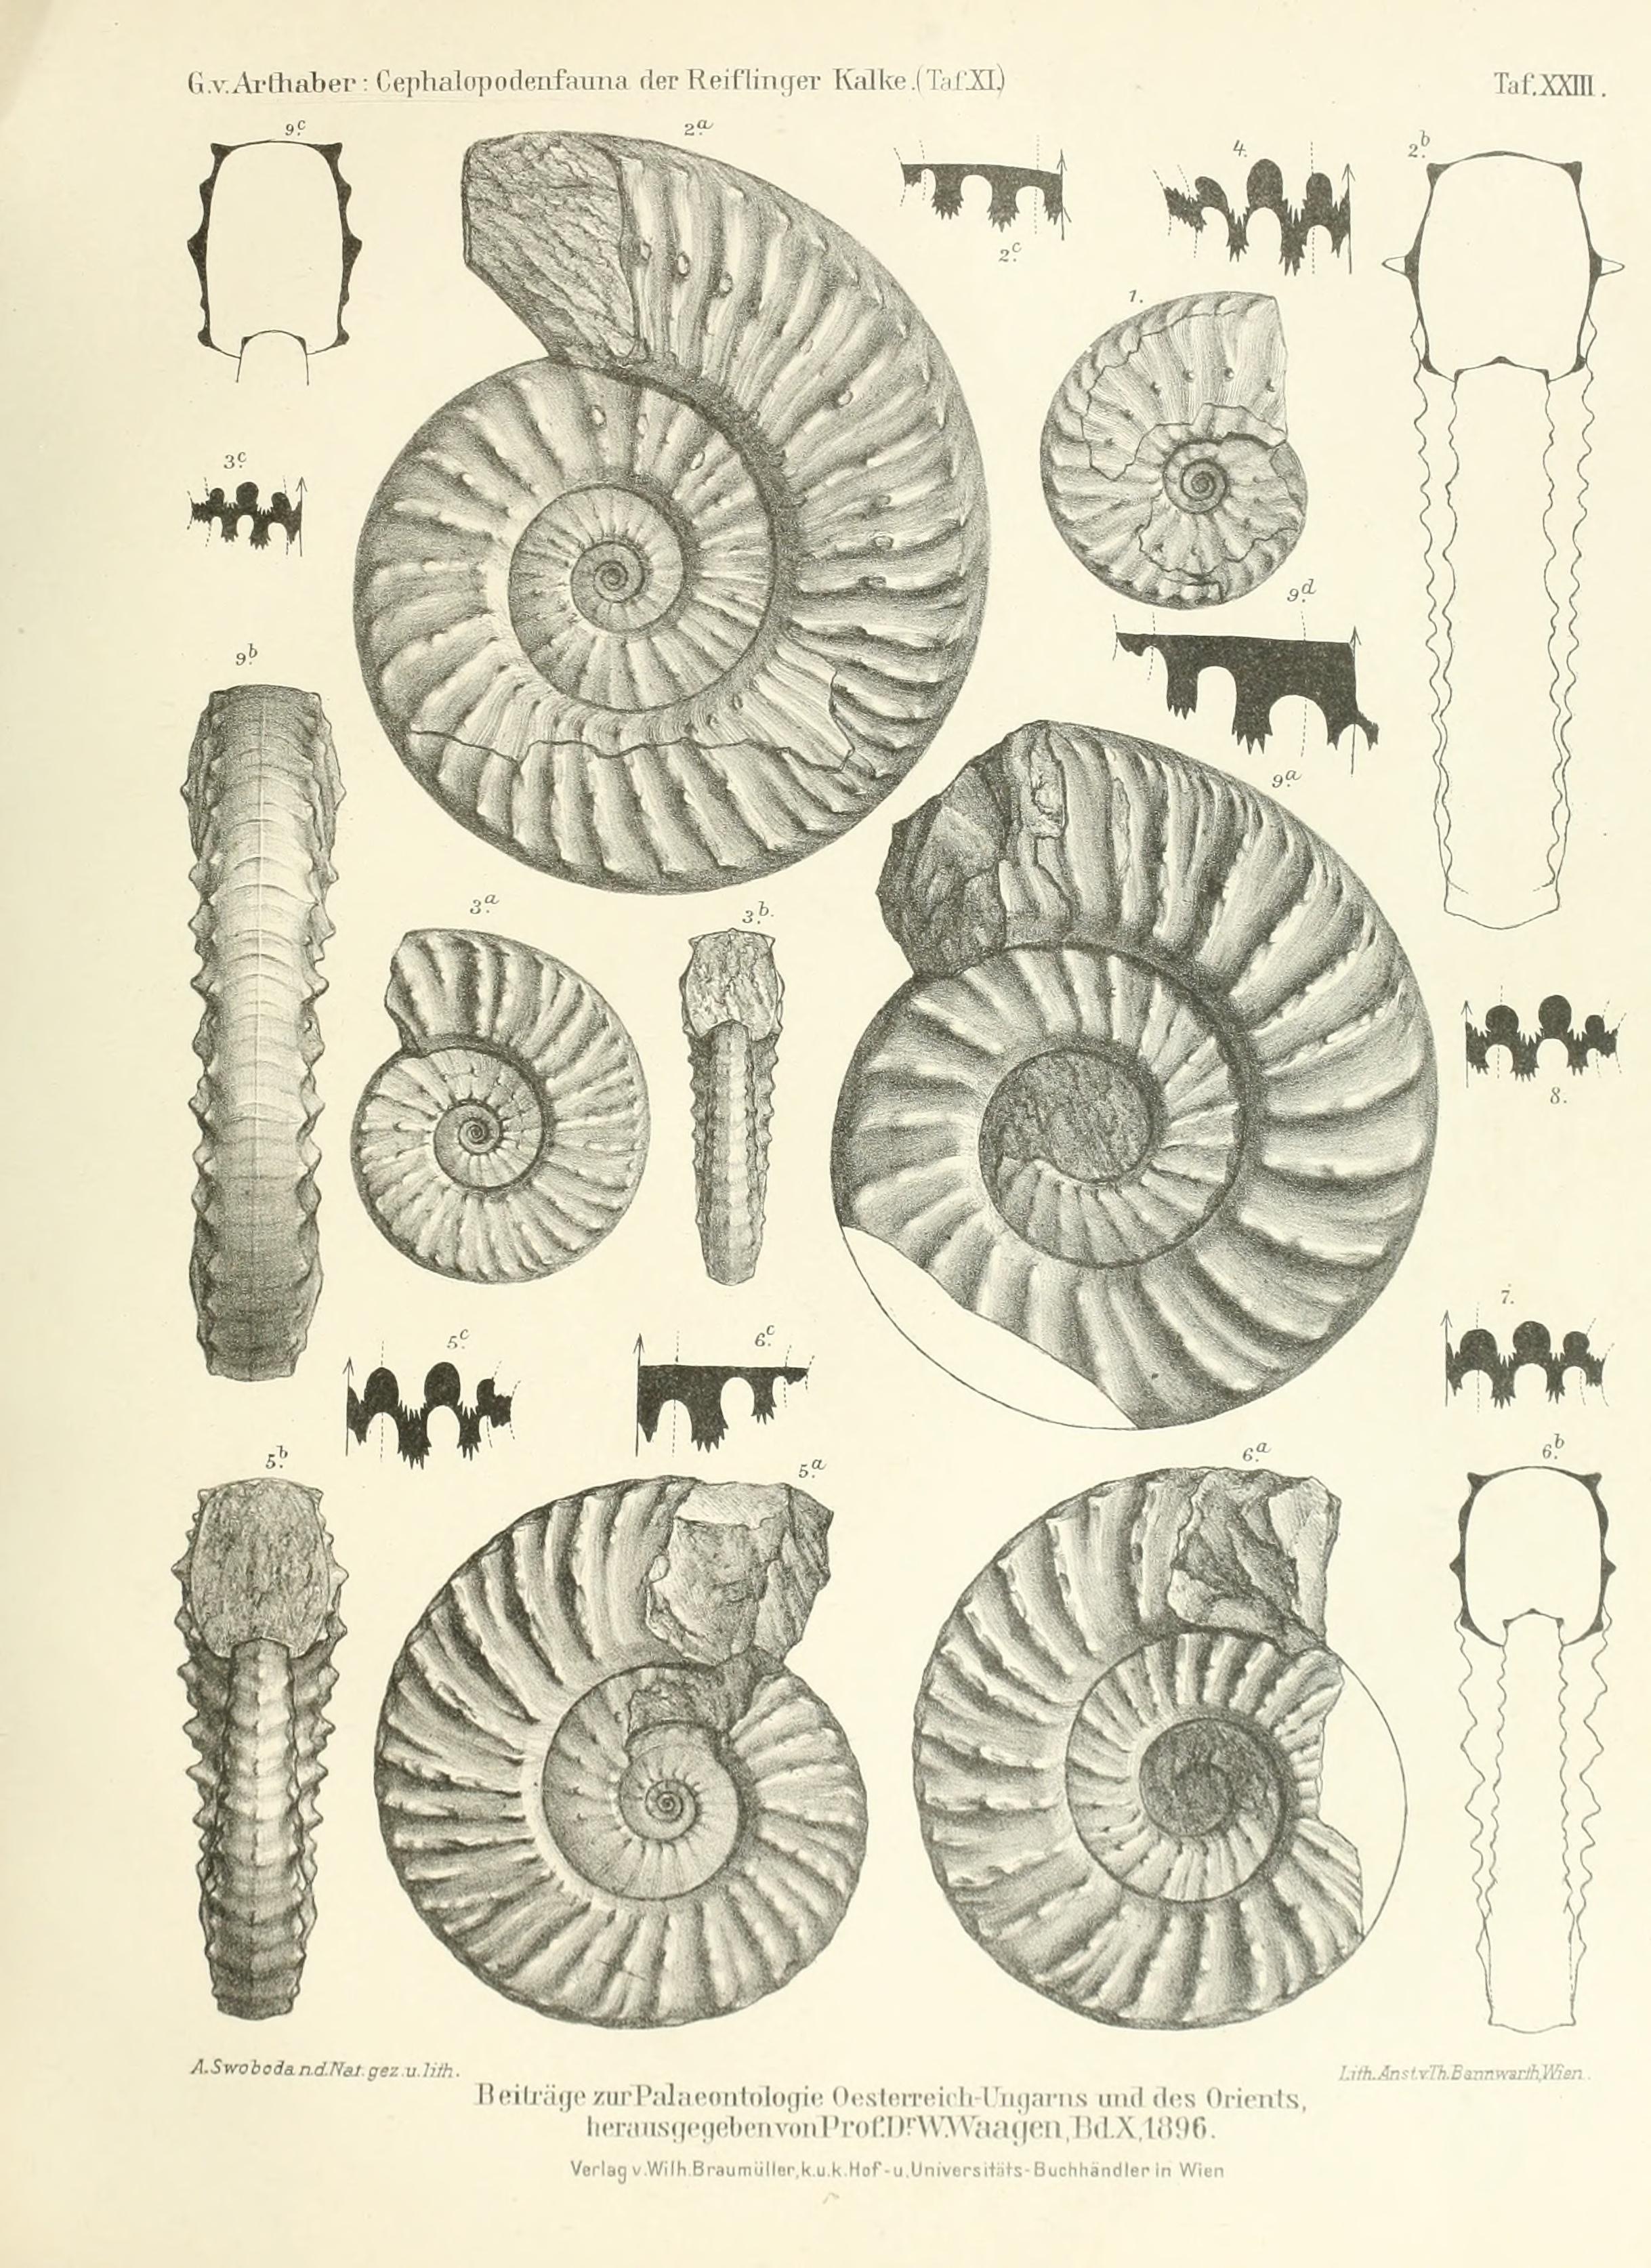 arthaber-cephalopodenfauna_1896_table_23_ceratites-balatonites.jpg